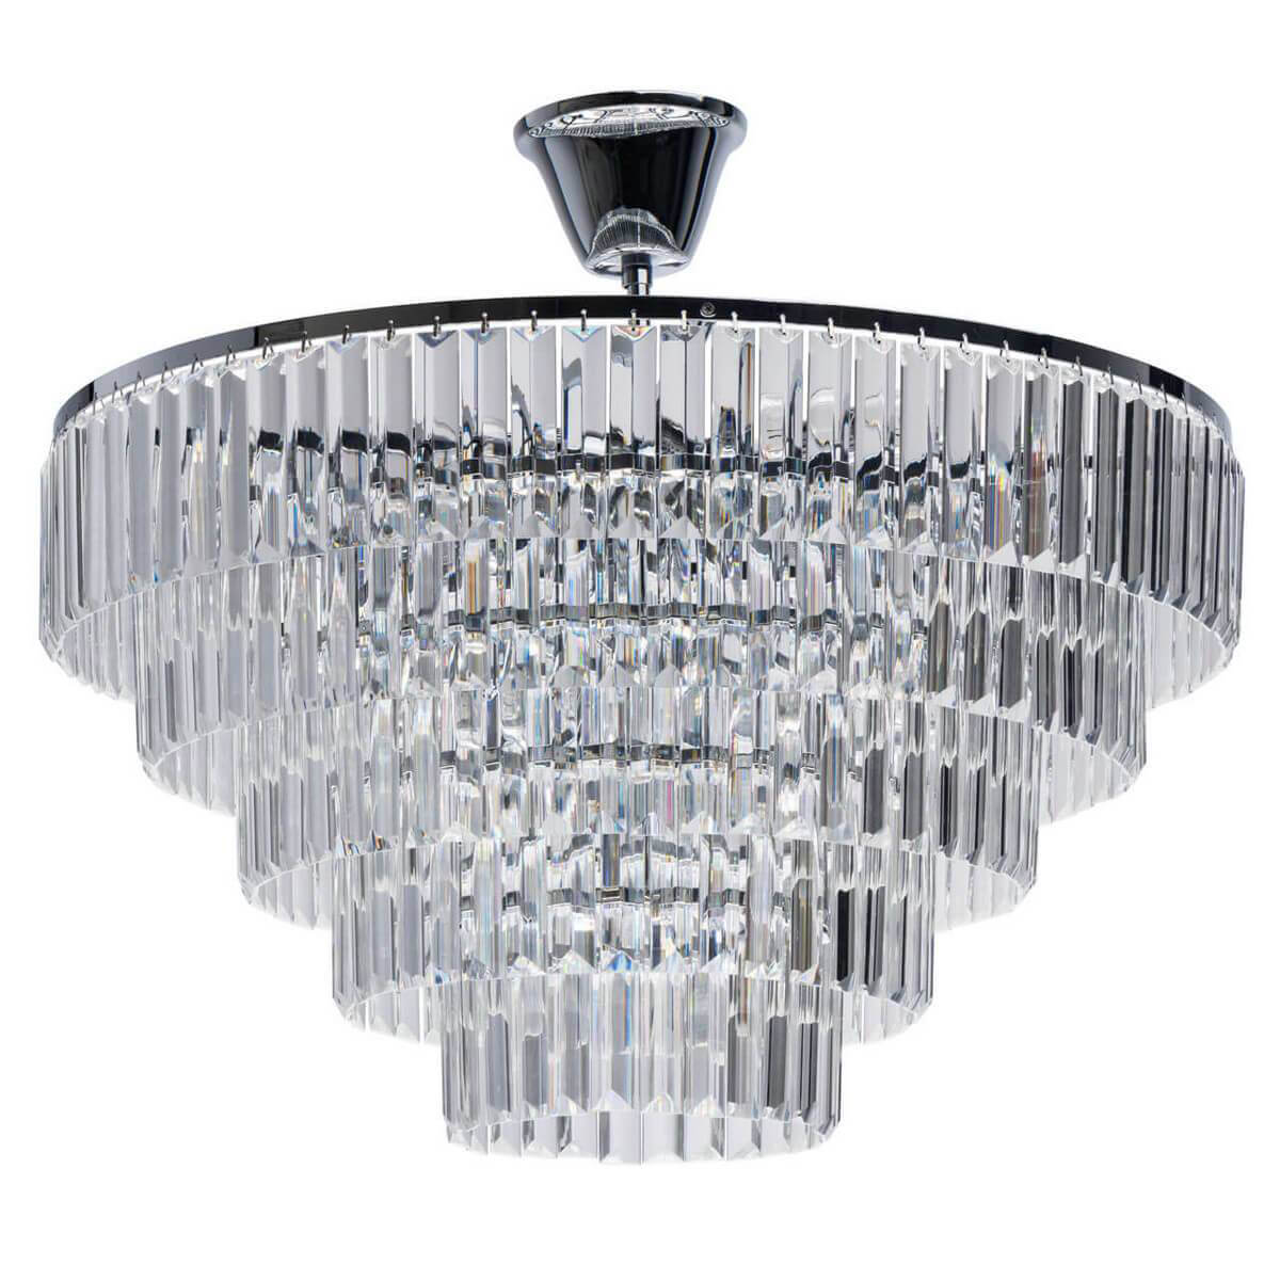 Люстра MW-Light 642013008 Аделард бра аделард mw light бра аделард